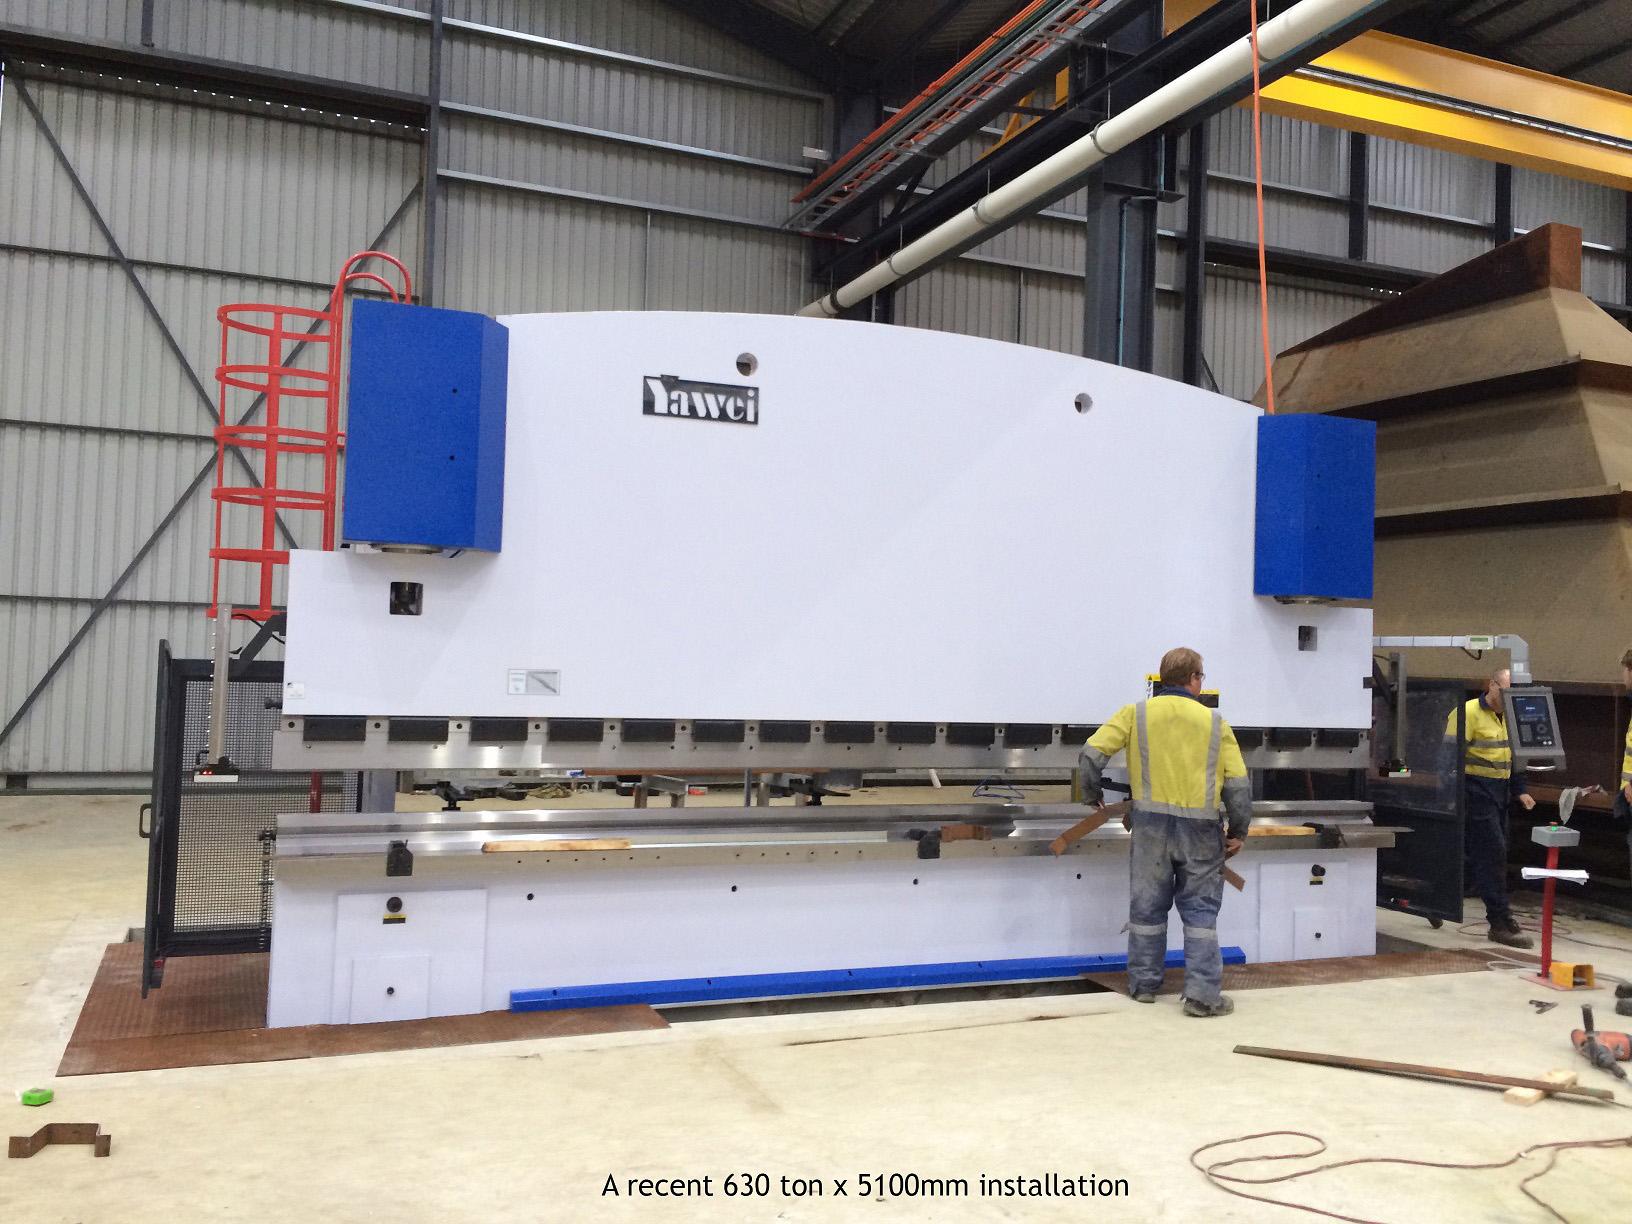 YAWEI PBH 500-4100 CNC5 (66T)